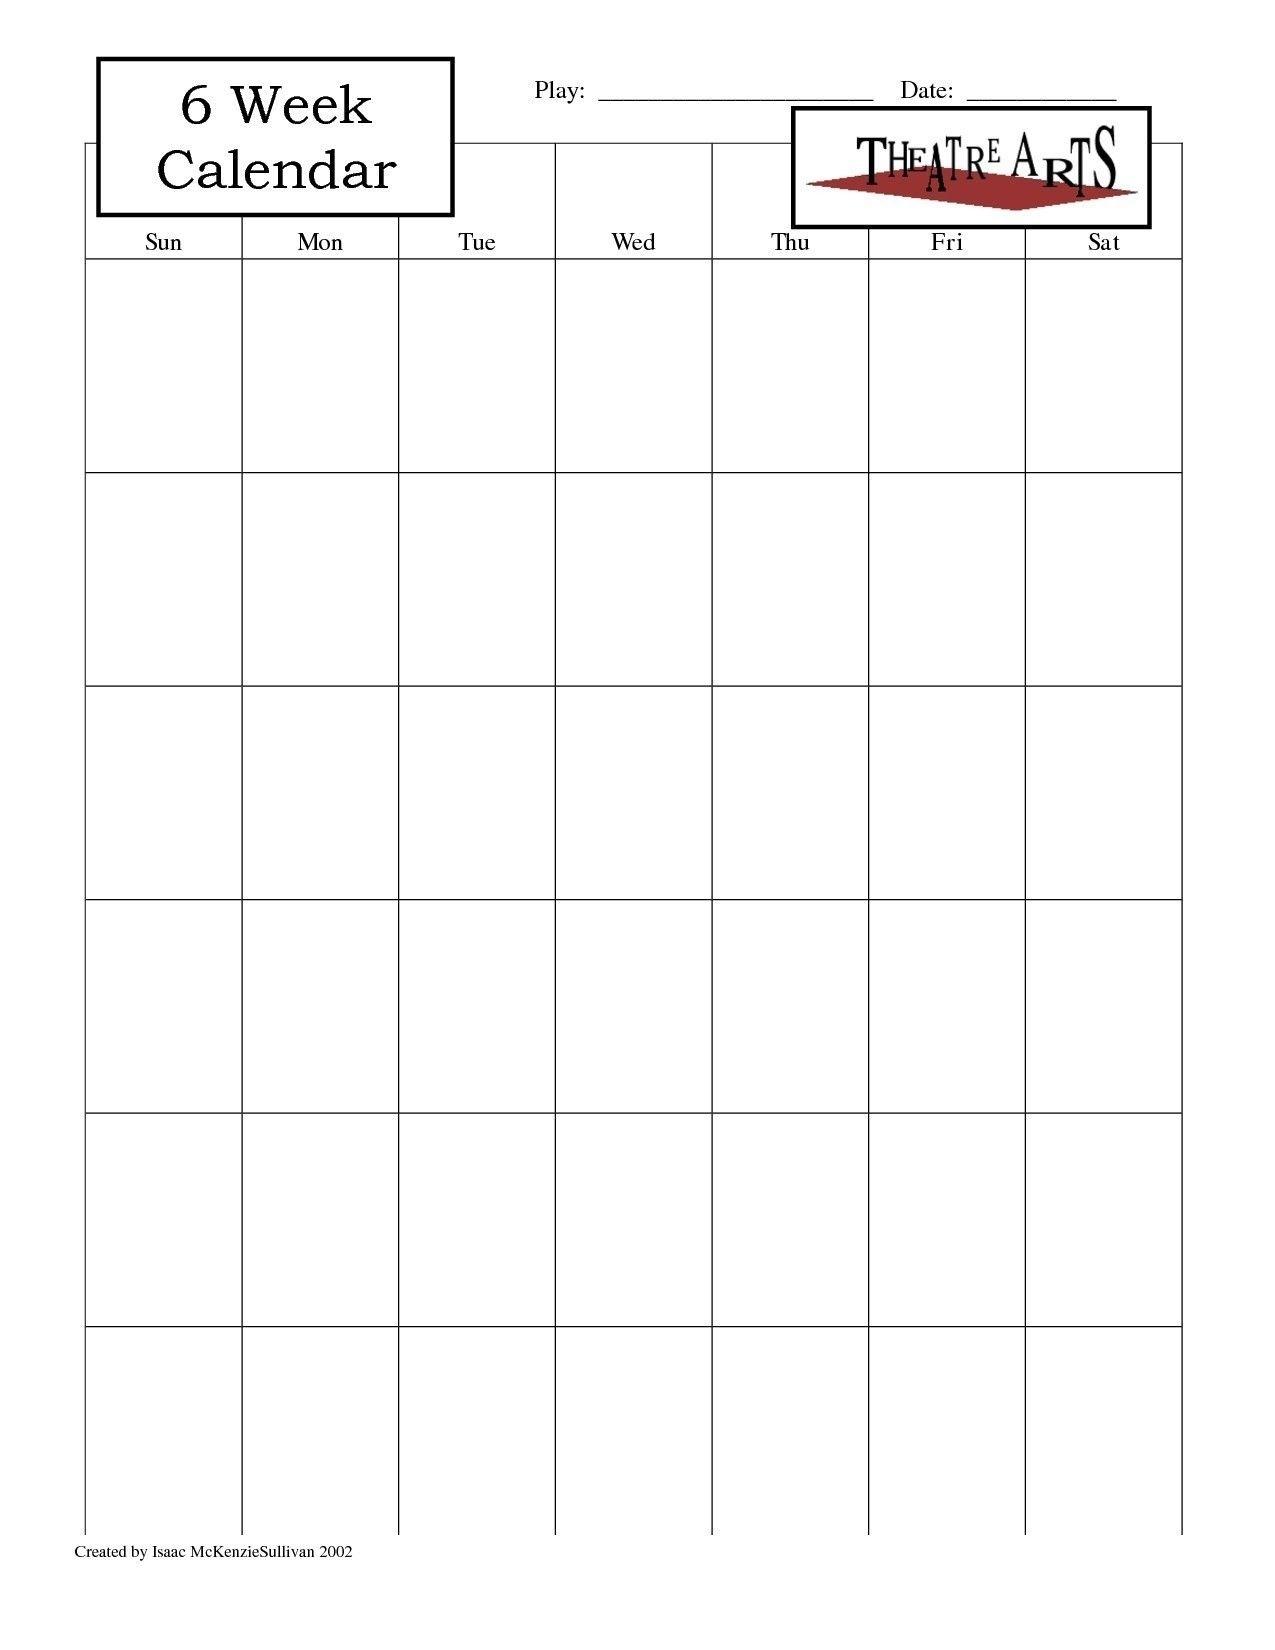 Catch 6 Week Blank Calendar Template | Blank Calendar